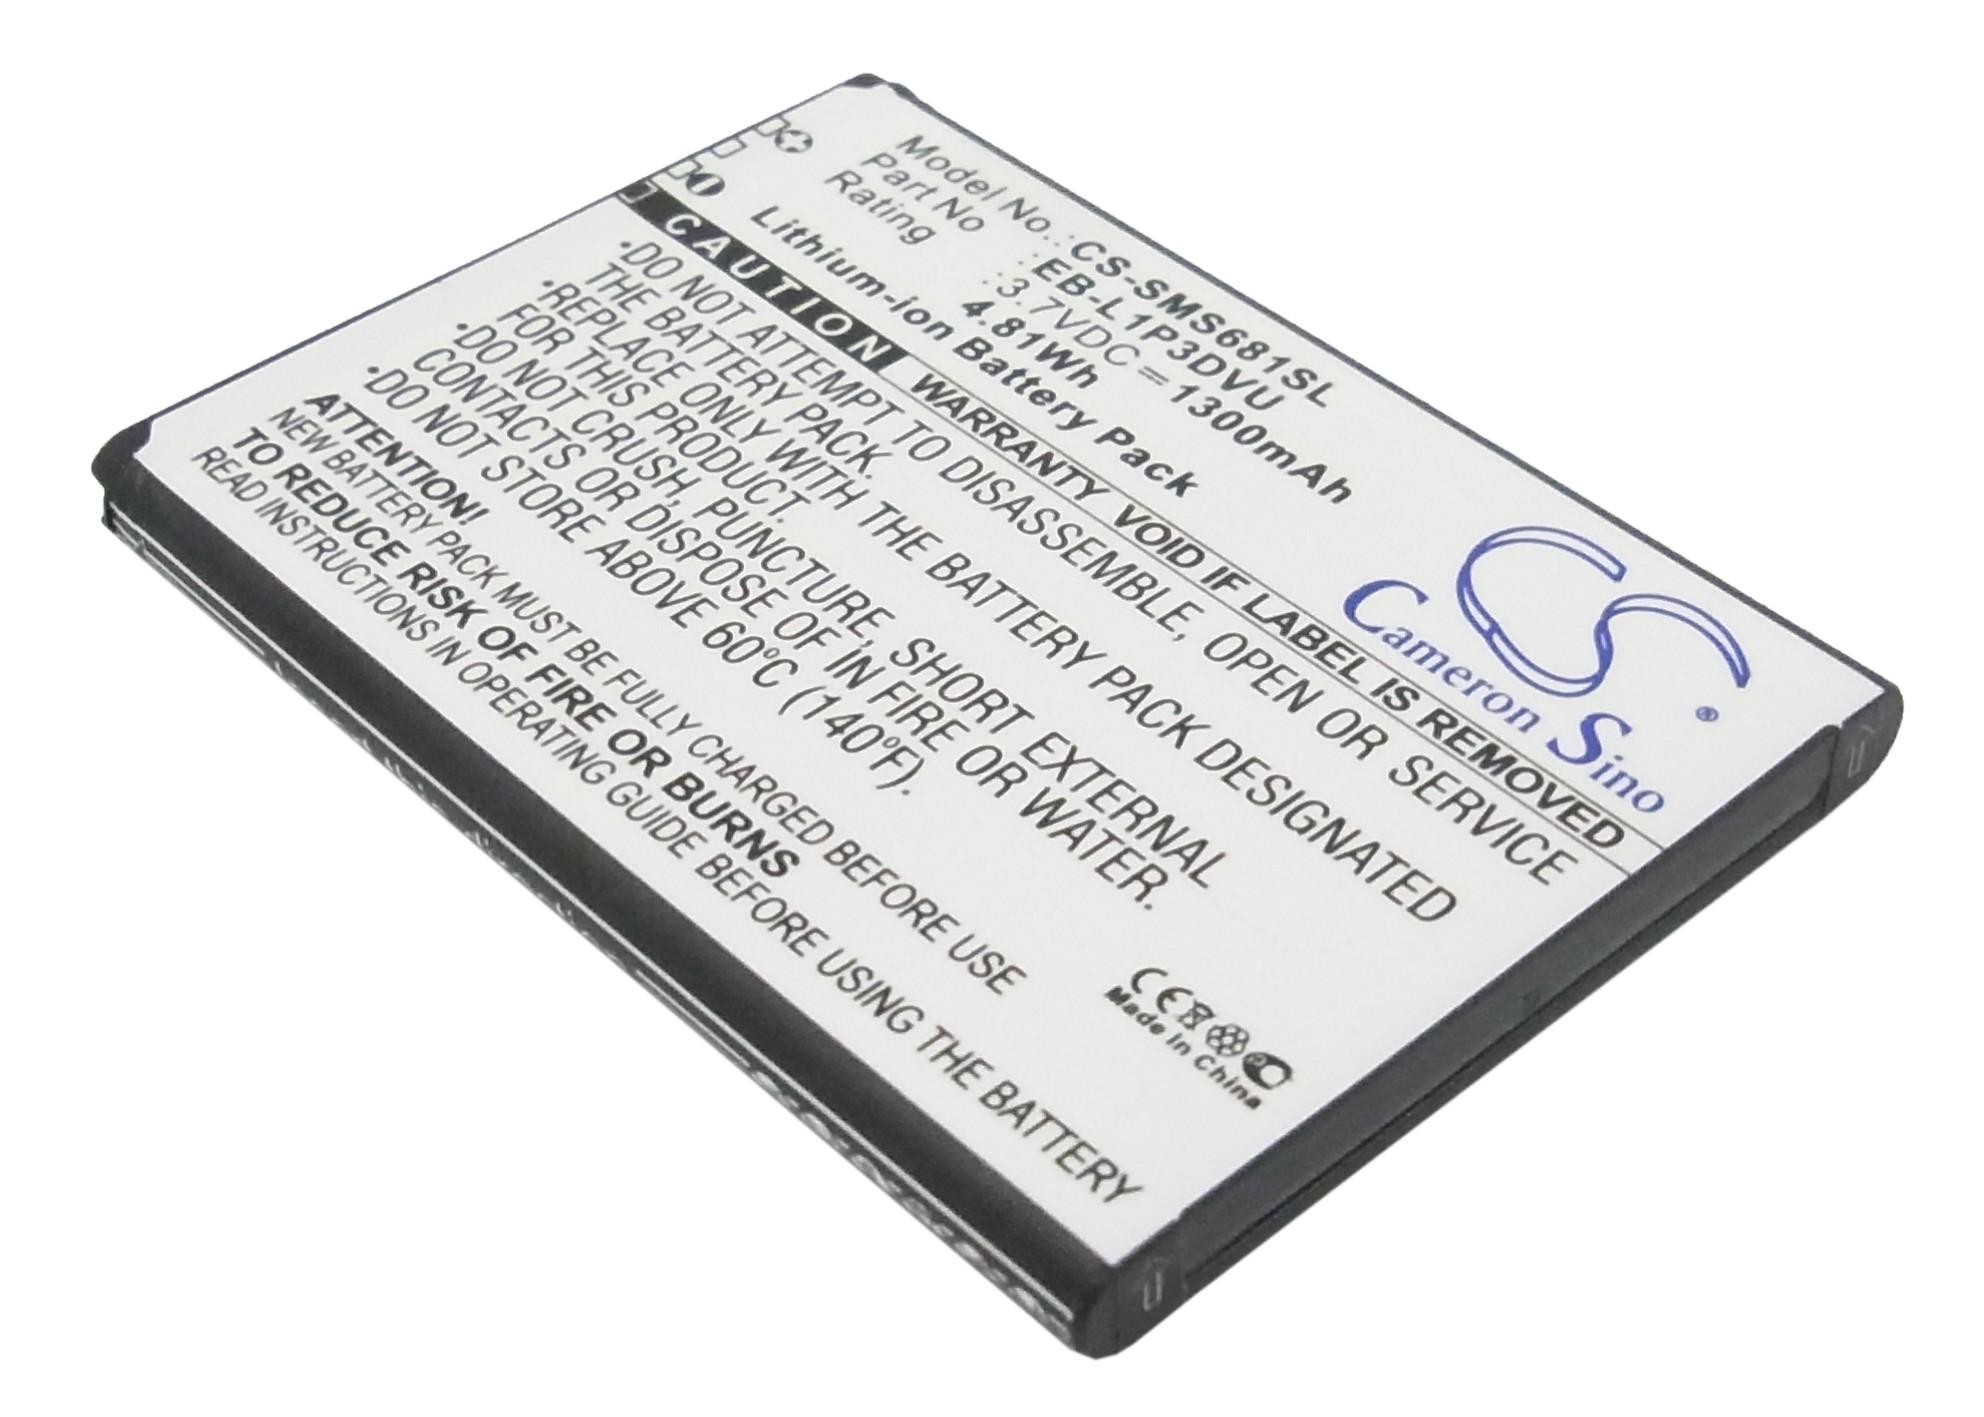 Cameron Sino baterie do mobilů pro SAMSUNG Galaxy Fame Lite 3.7V Li-ion 1300mAh černá - neoriginální